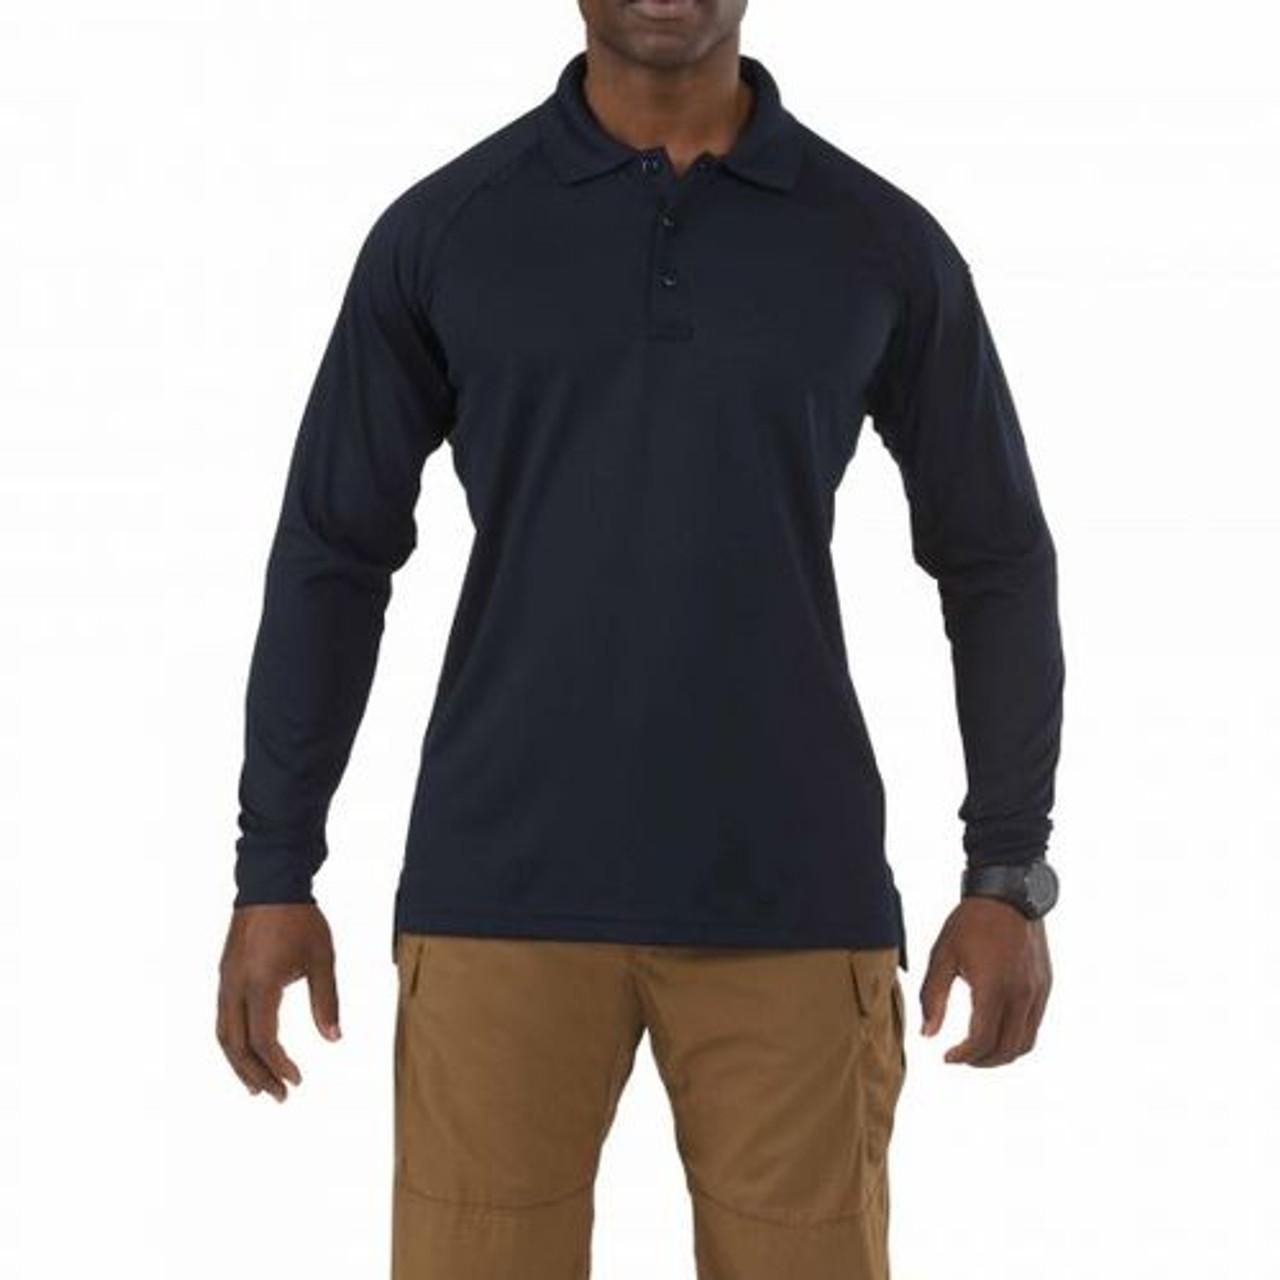 5.11 Tactical 72049, Men's Performance, Long Sleeve Uniform or Casual Polo Shirt